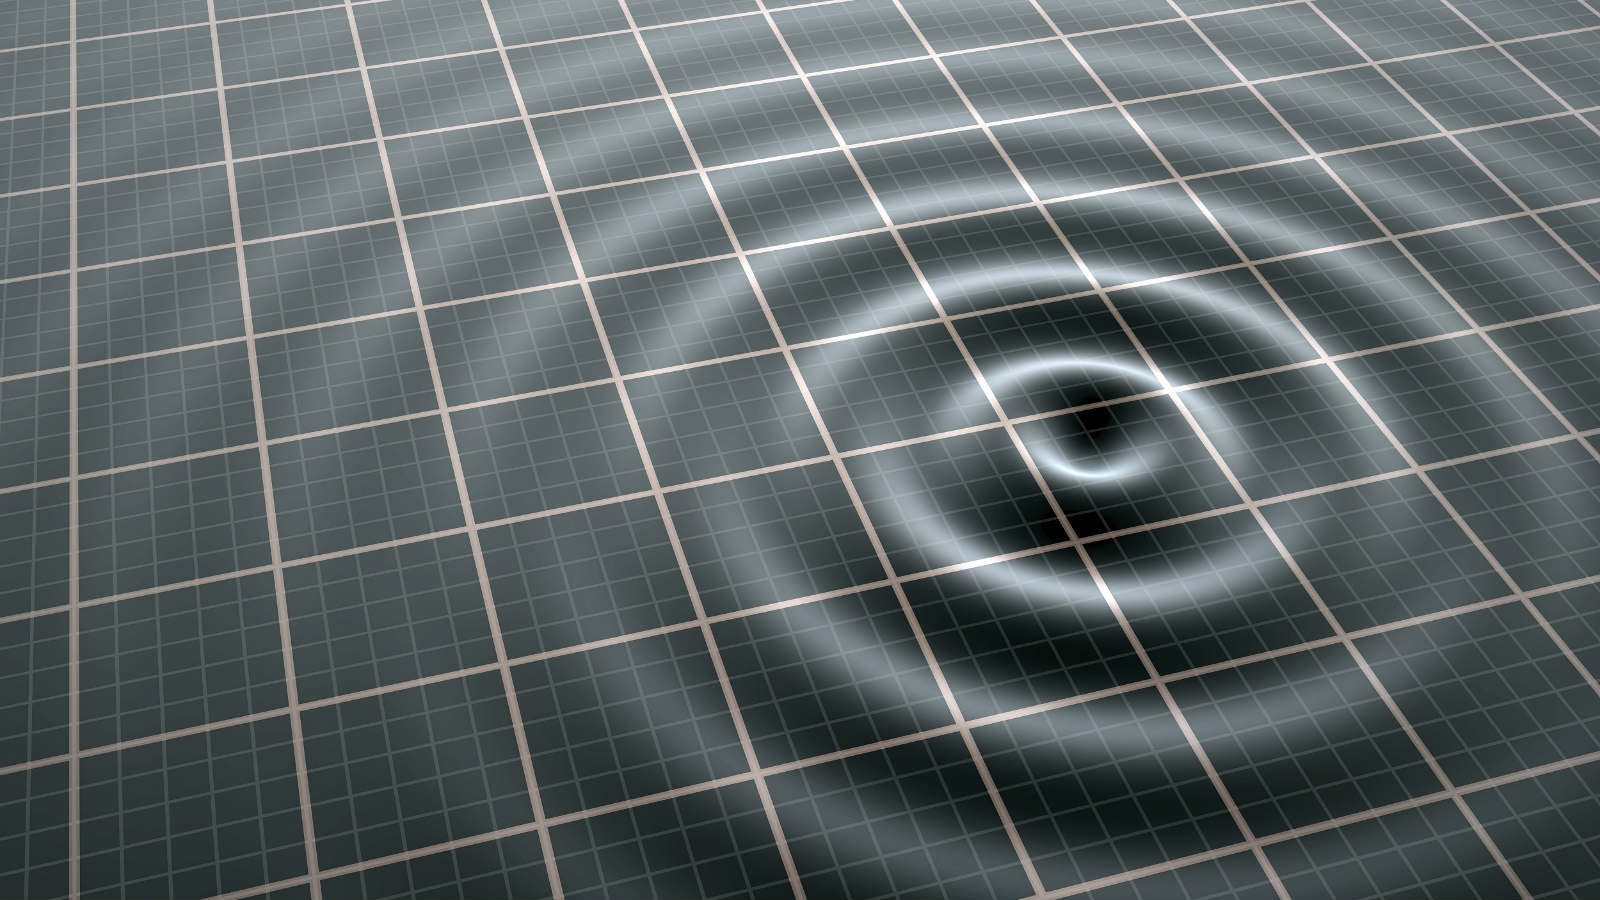 6.2-magnitude quake hits 147 km SSW of Port-Vila, Vanuatu -- USGS